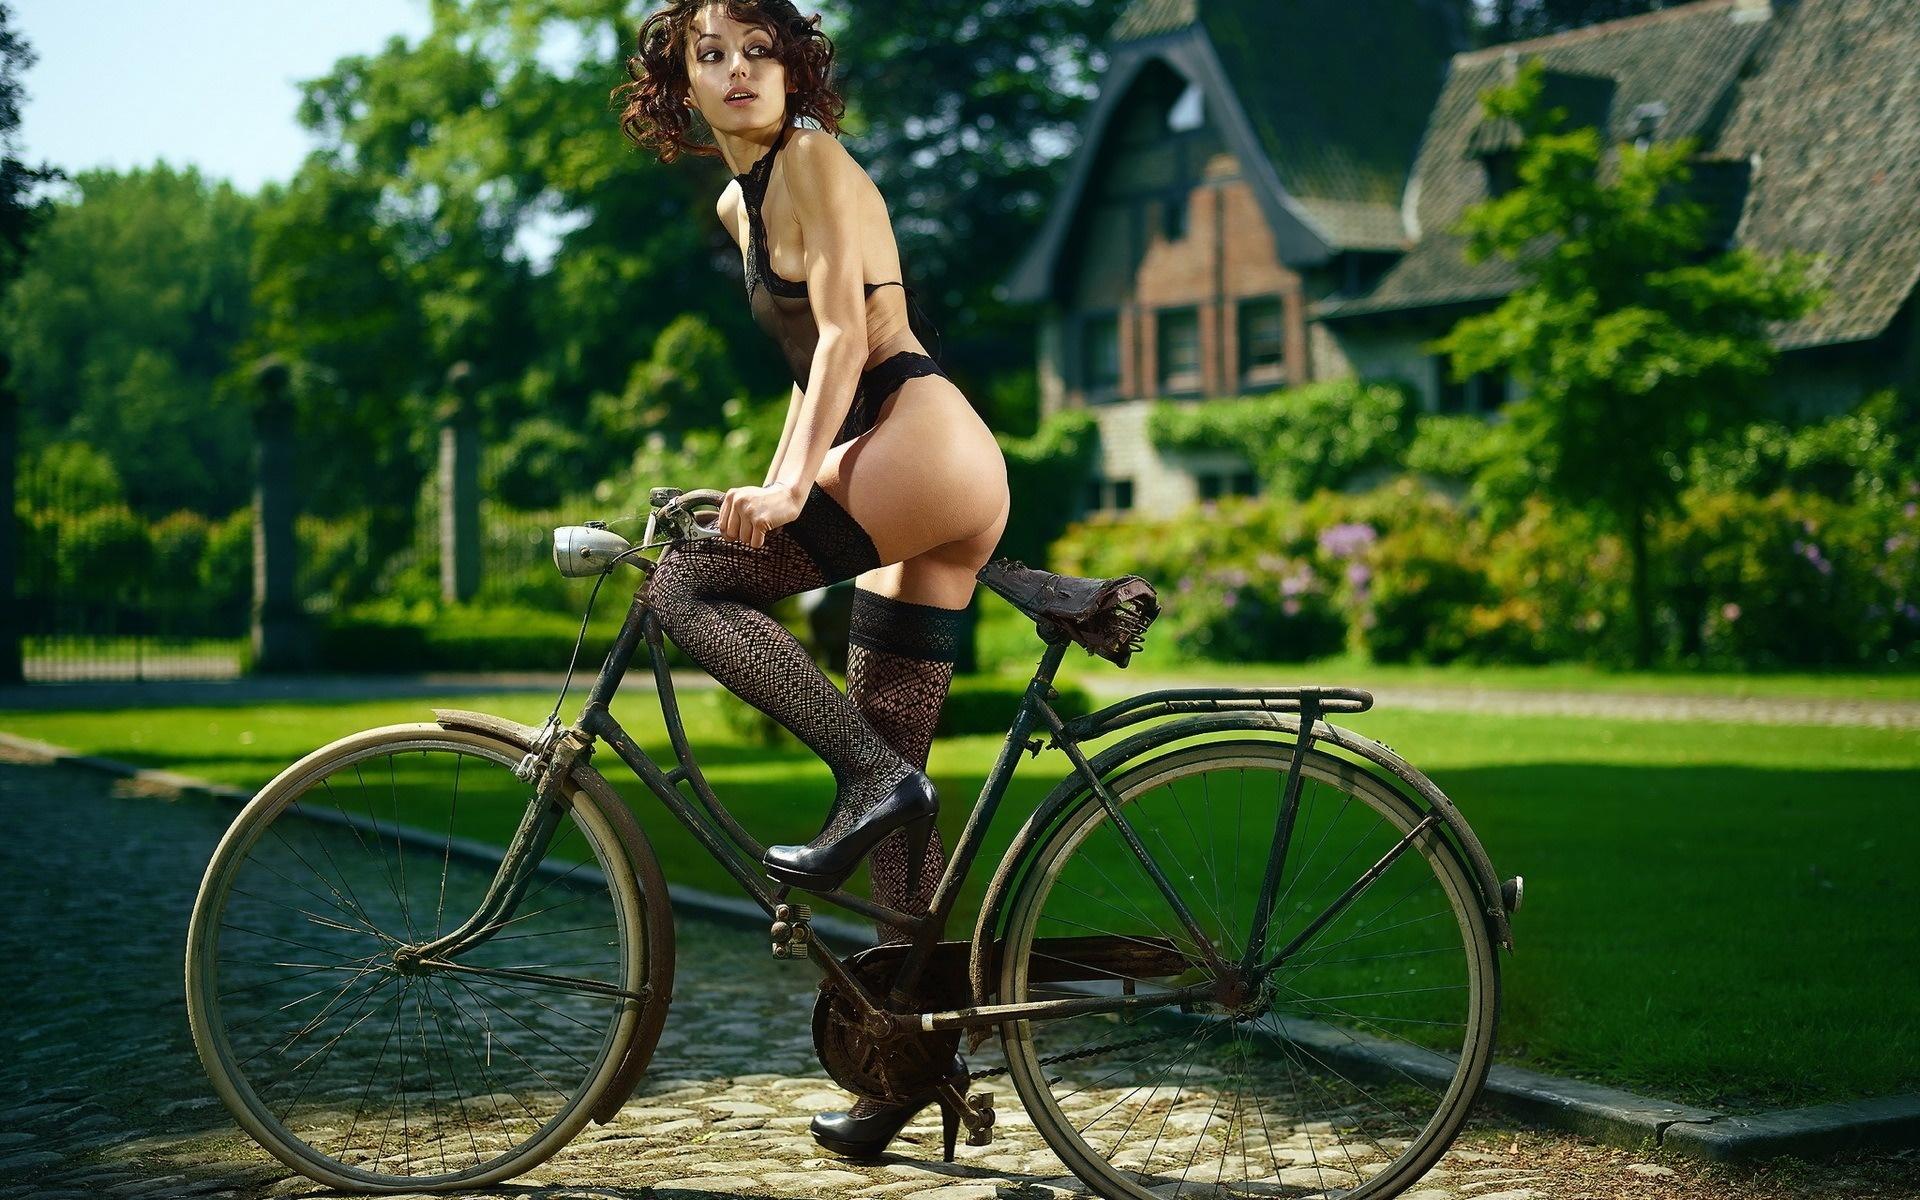 Секс на седле велосипеда 14 фотография